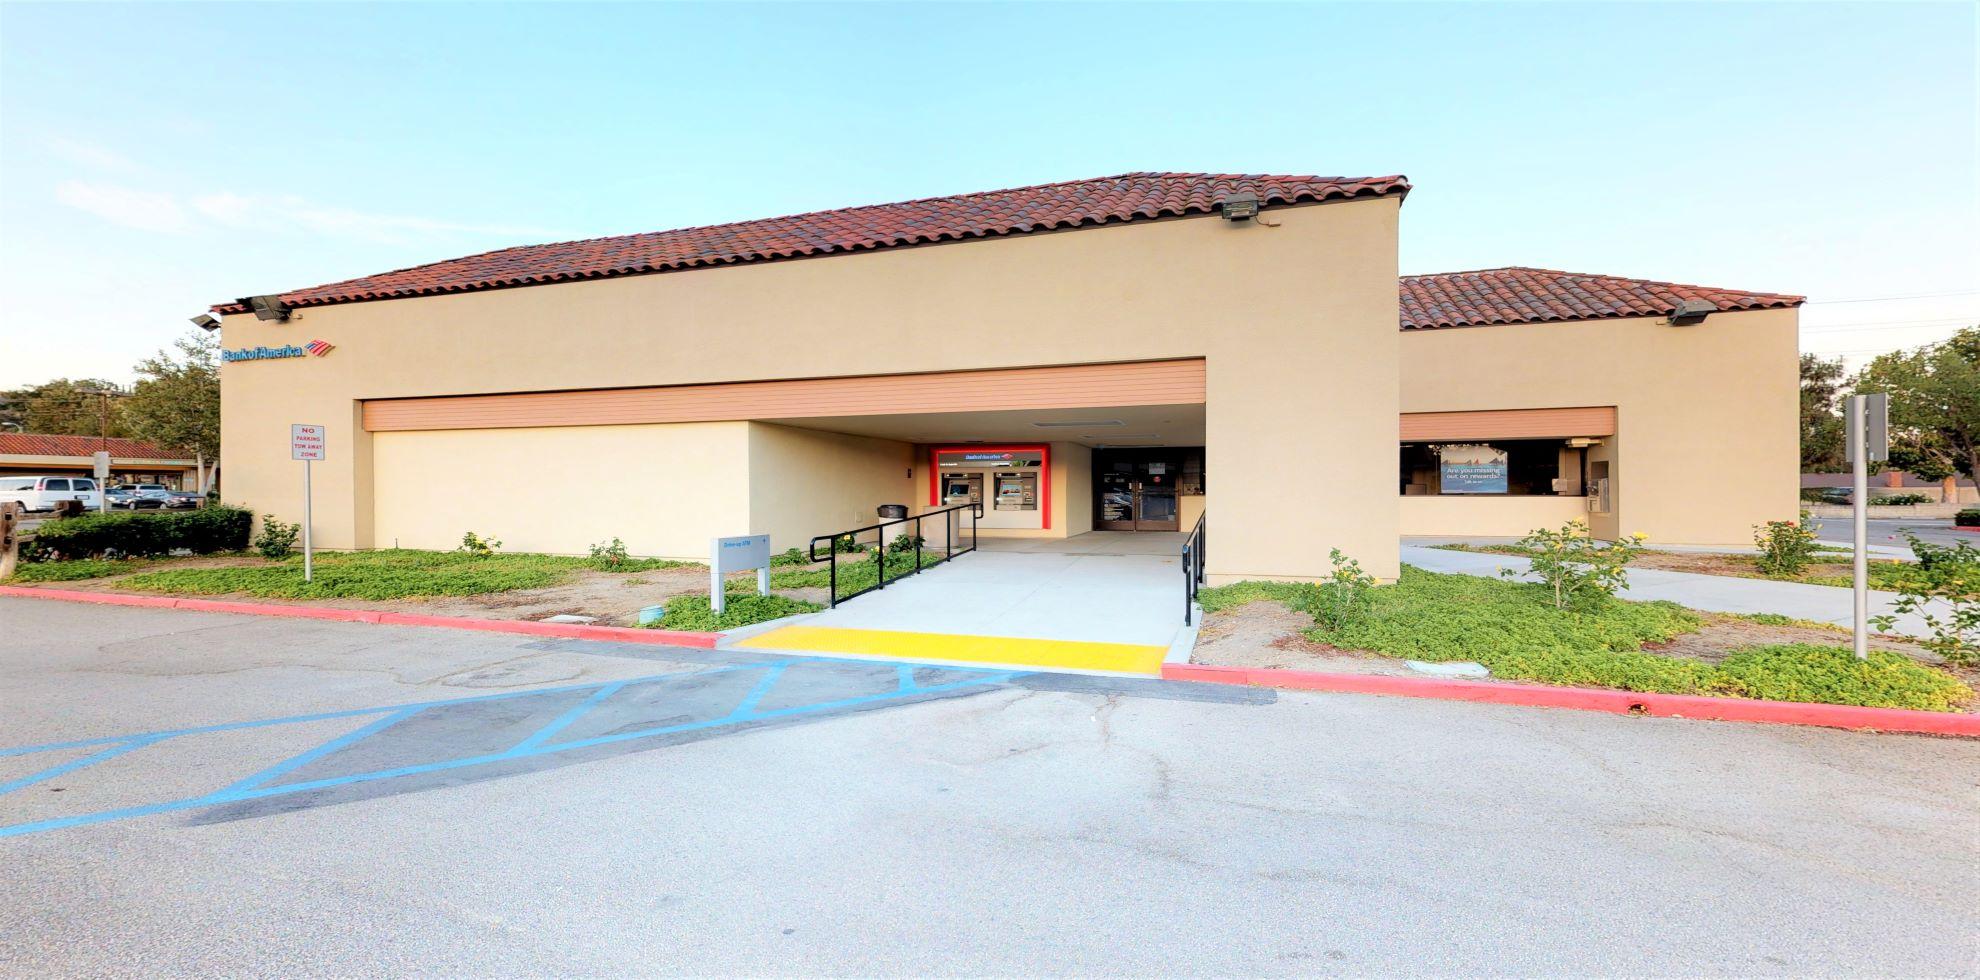 Bank of America financial center with drive-thru ATM   5667 Kanan Rd, Agoura, CA 91301